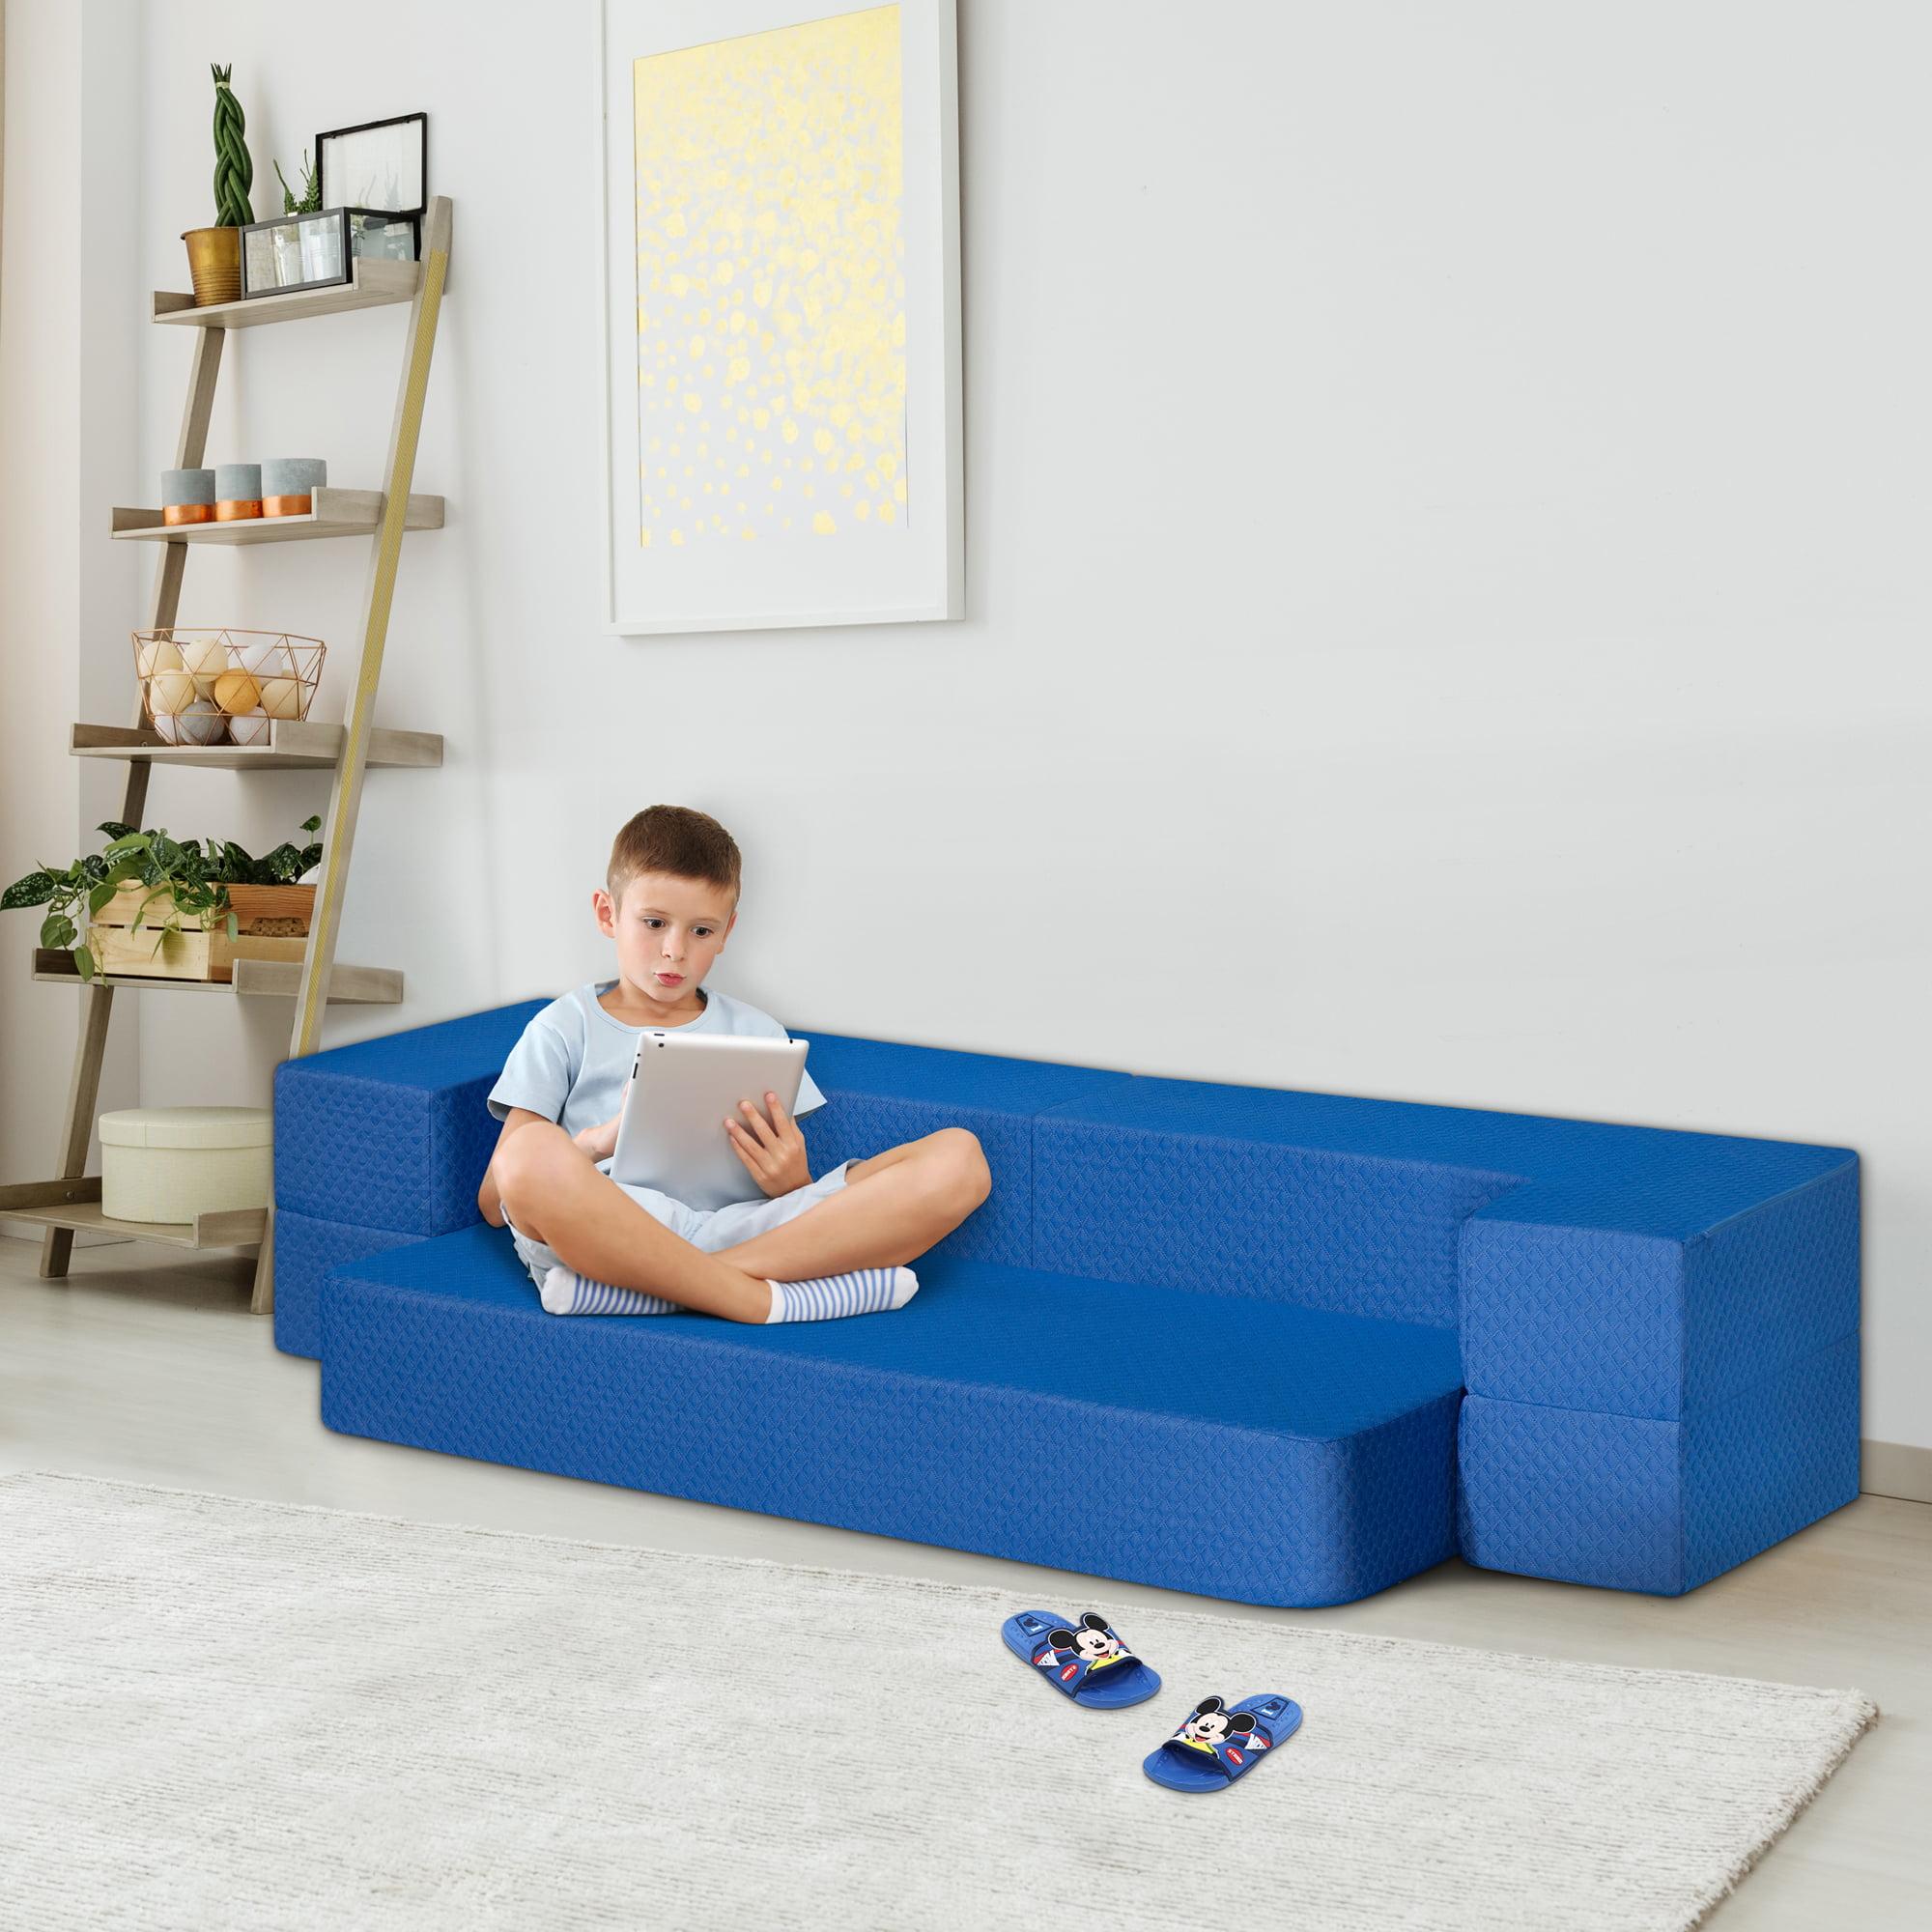 GranRest 8'' 3-in-1 Gel Memory Foam Mattress & Sofa Bed, Blue